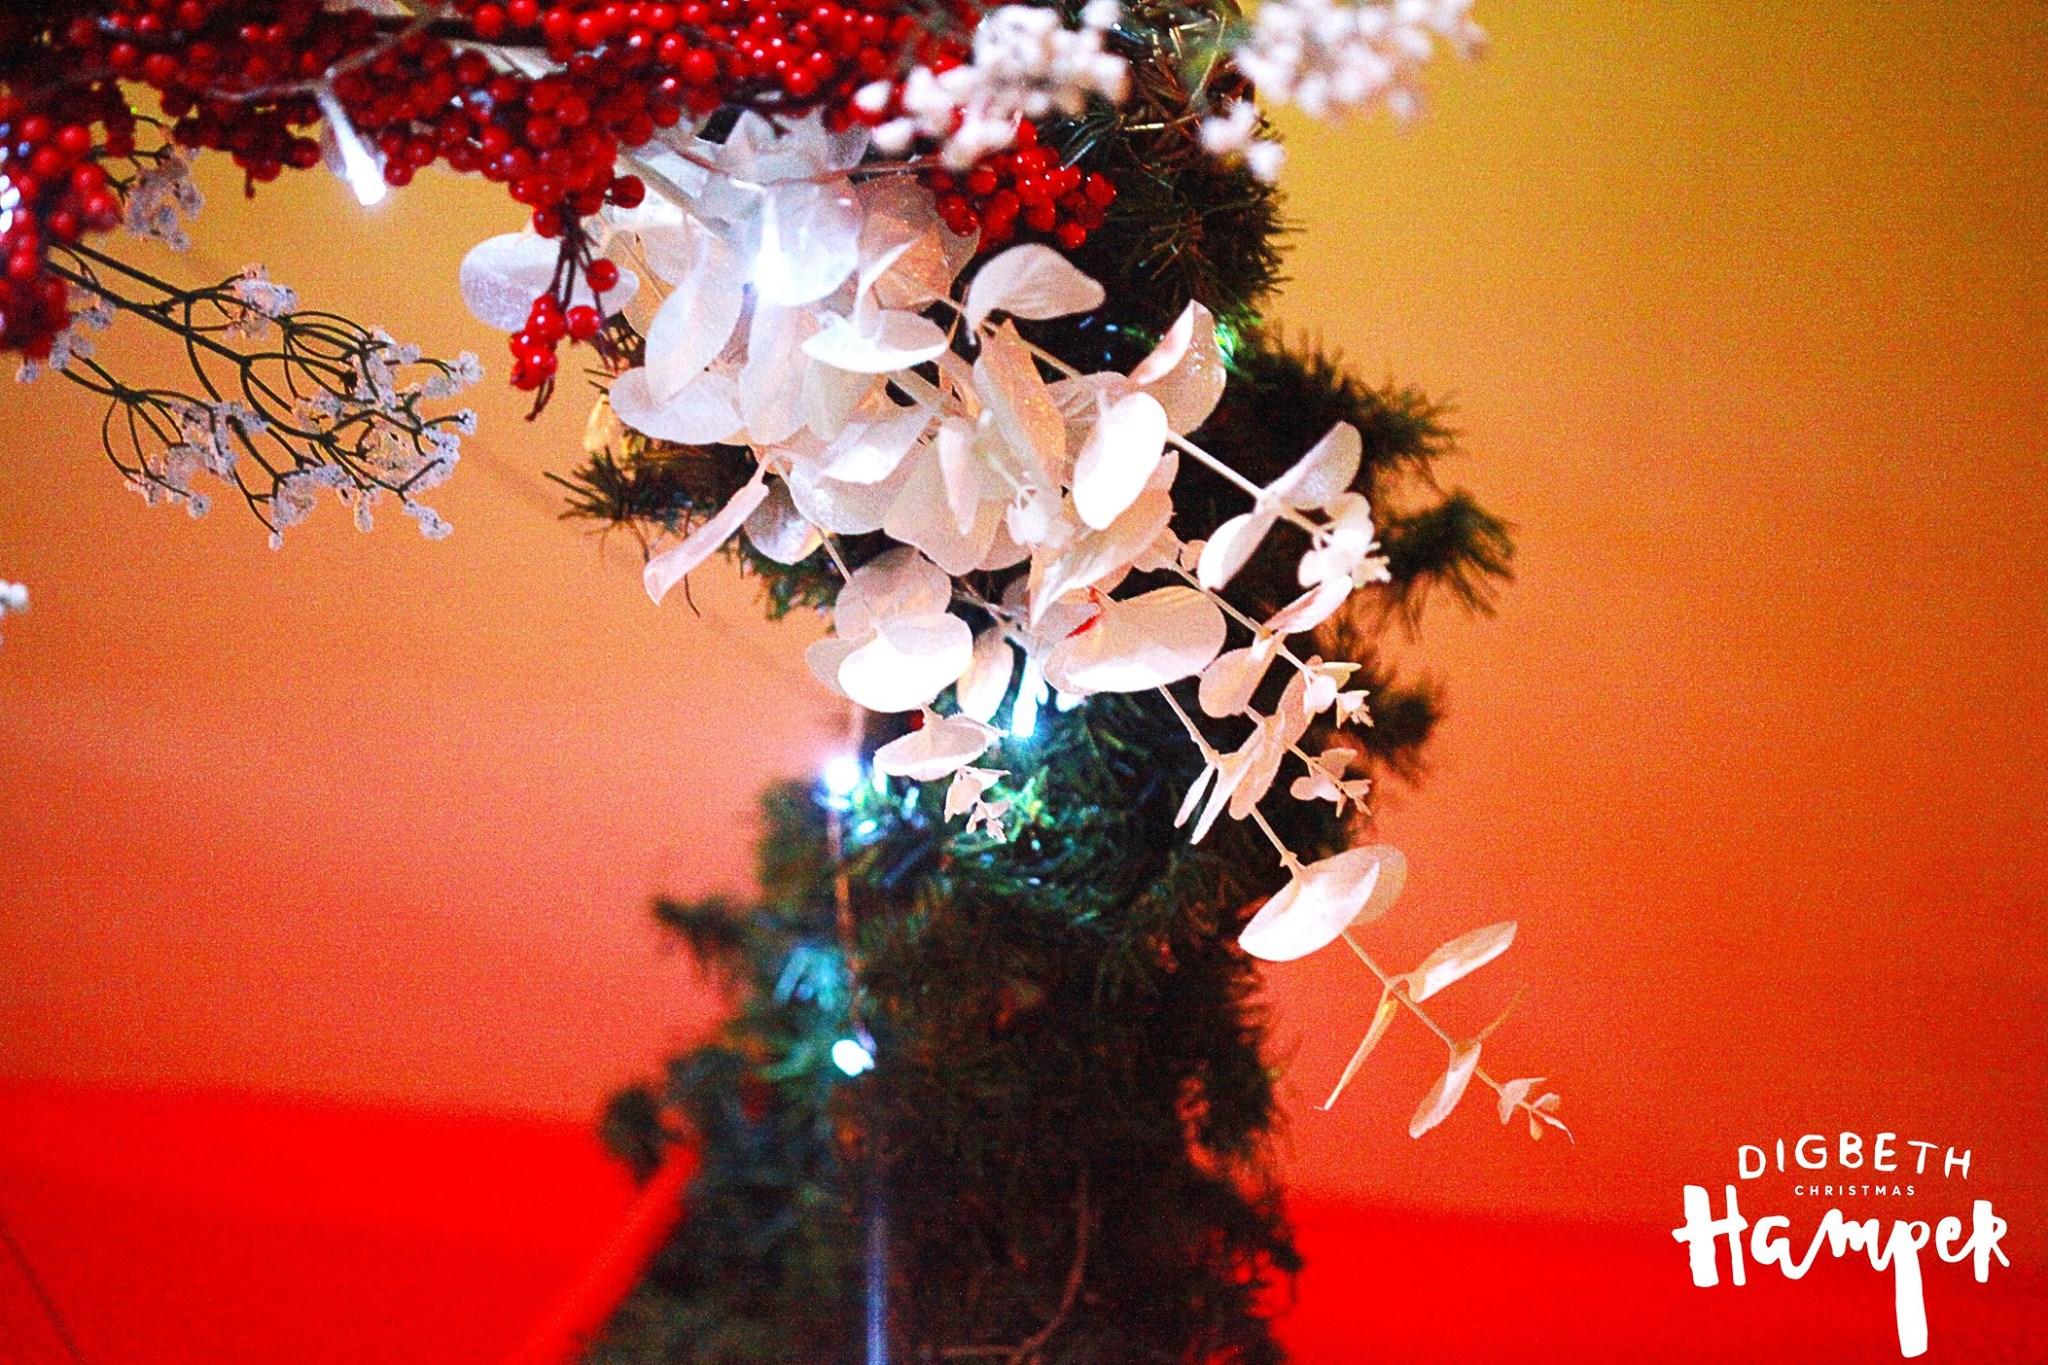 Digbeth Christmas Hamper